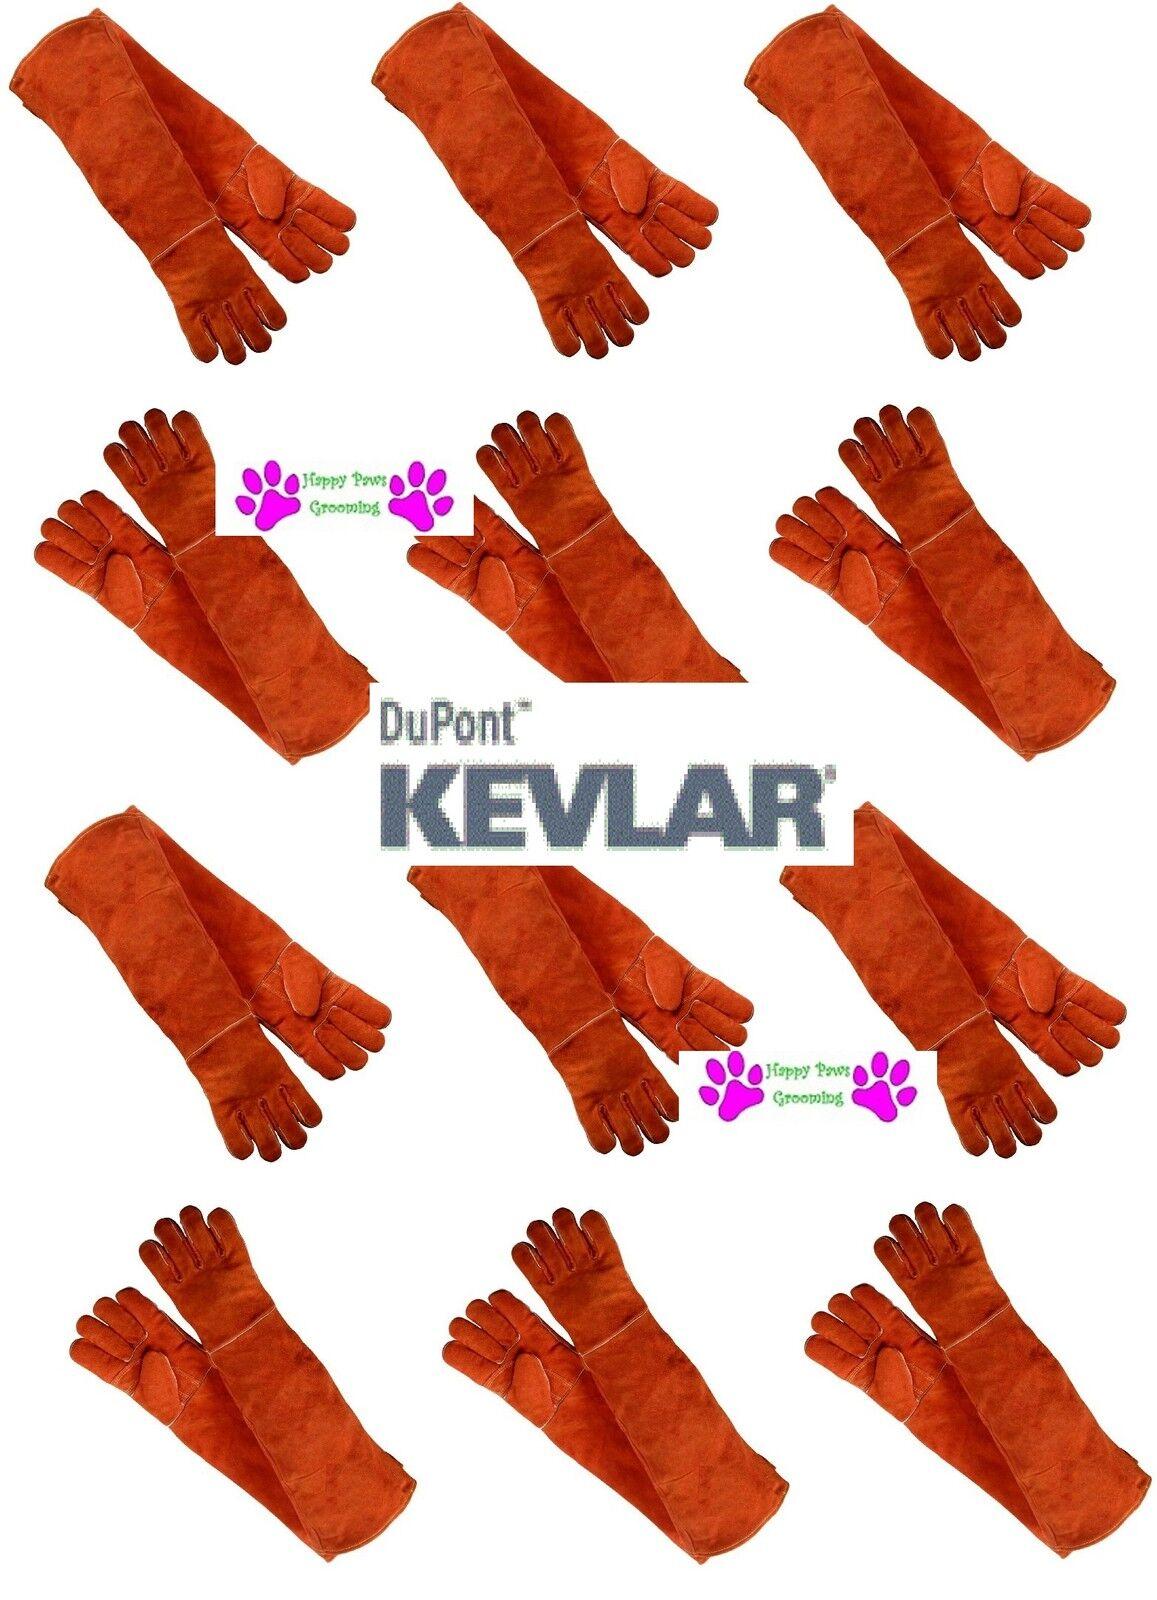 12 Pair Cuoio con Kevlar Animale Maneggiare Guanti Braccio Lungo